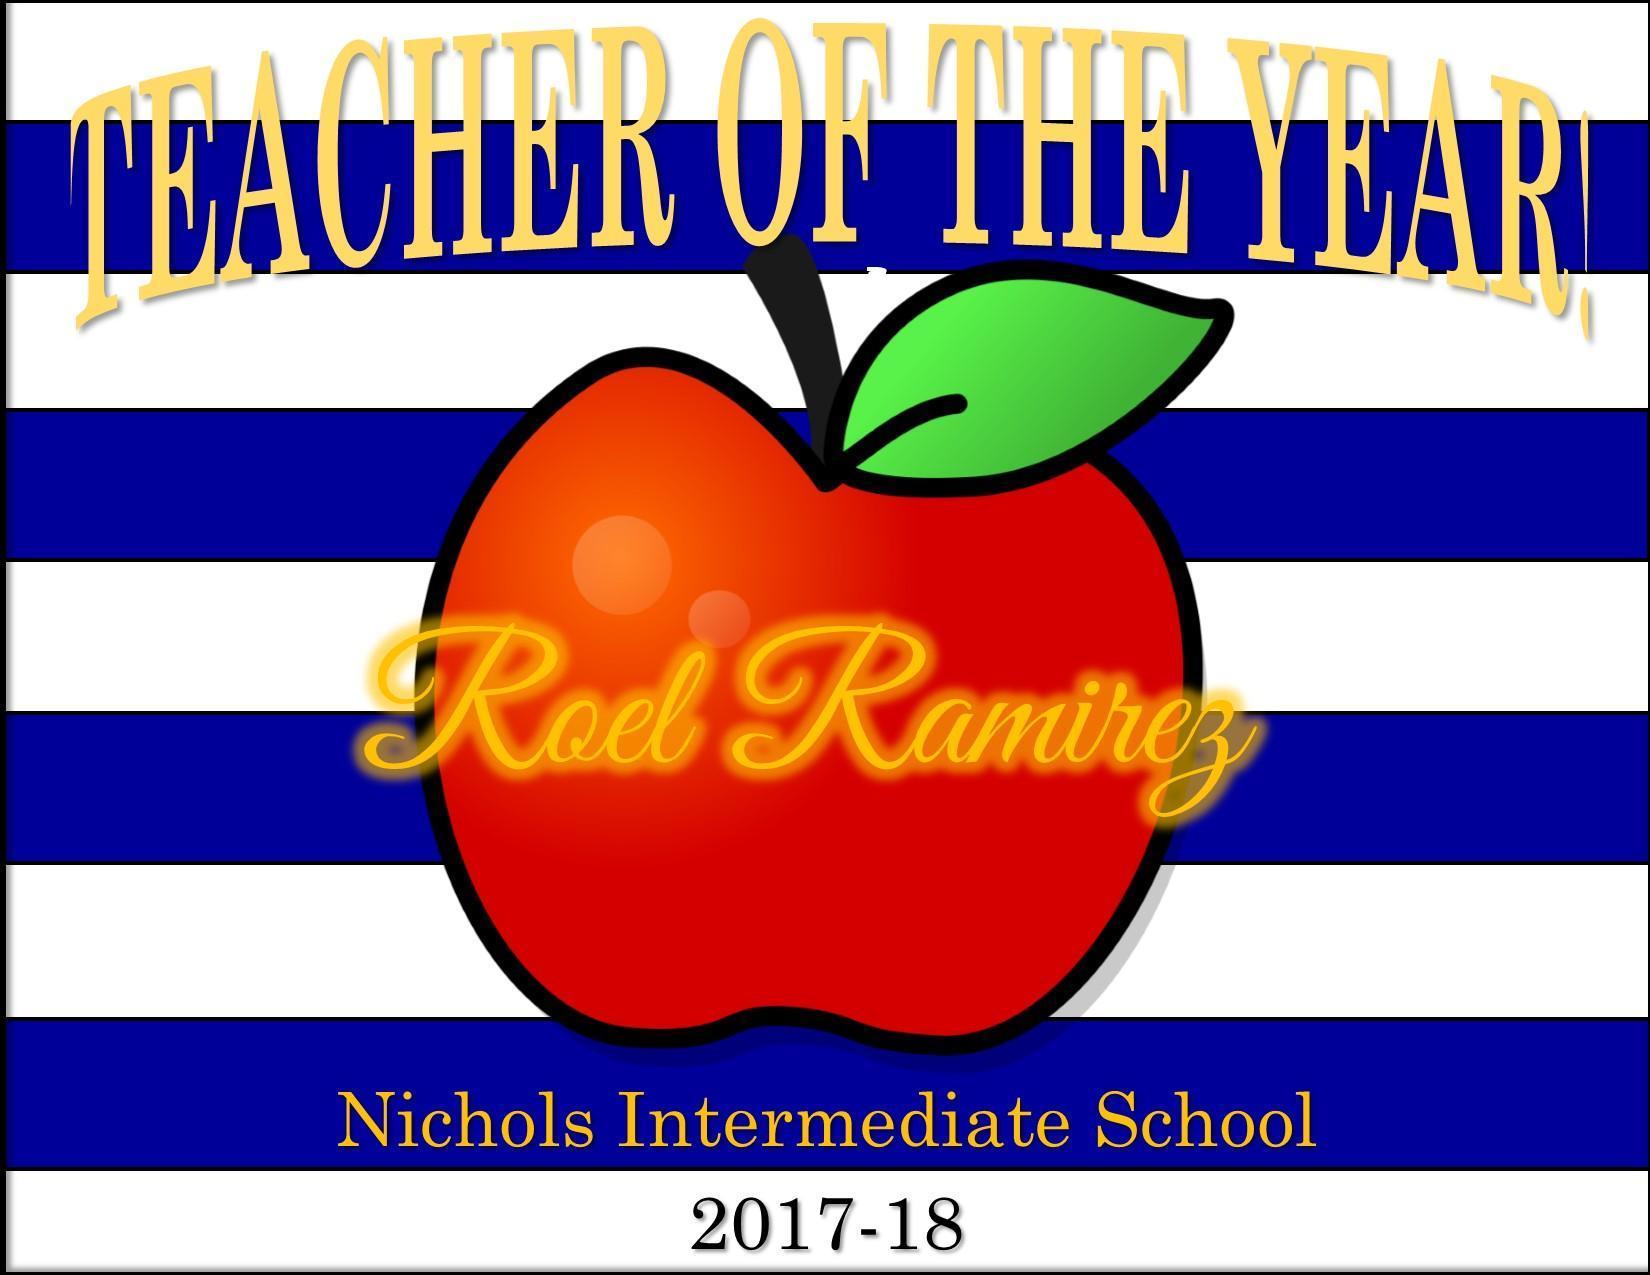 poster for Nichols teacher of the Year Roel Ramirez